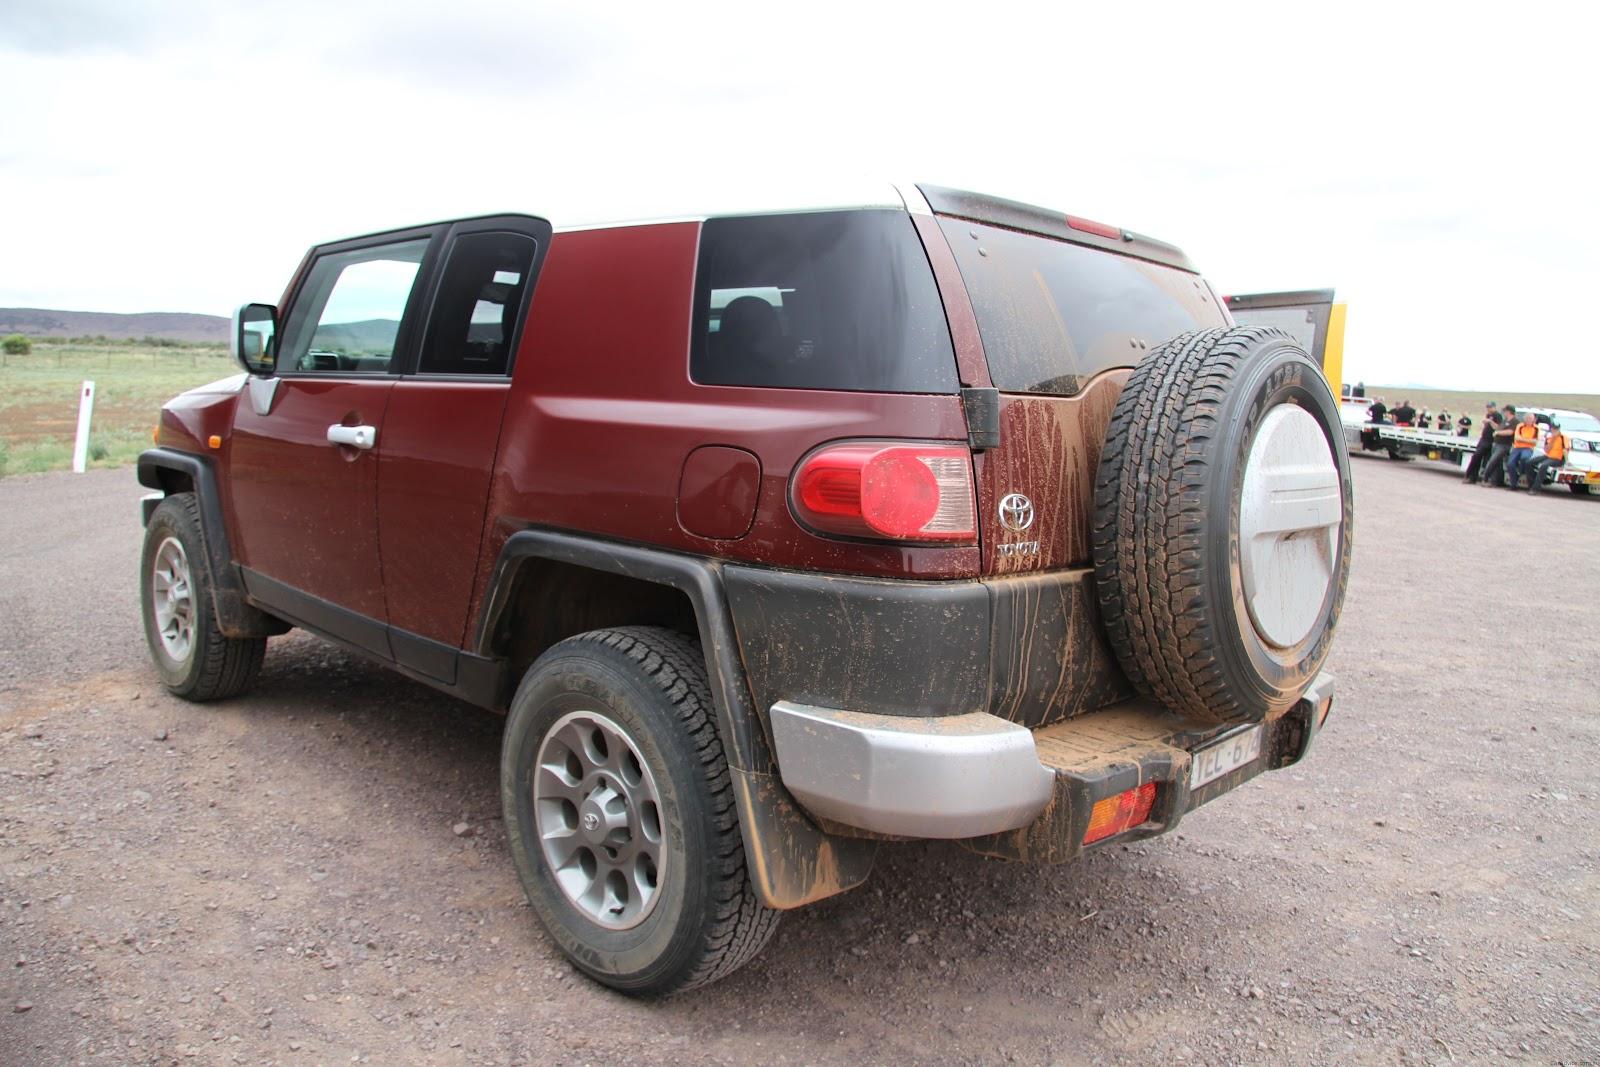 http://1.bp.blogspot.com/-vYV8-bo5C2c/T2byQqzzGXI/AAAAAAAAAv4/tVoedGwWV90/s1600/Toyota_FJ_Rear_Maroon.jpg